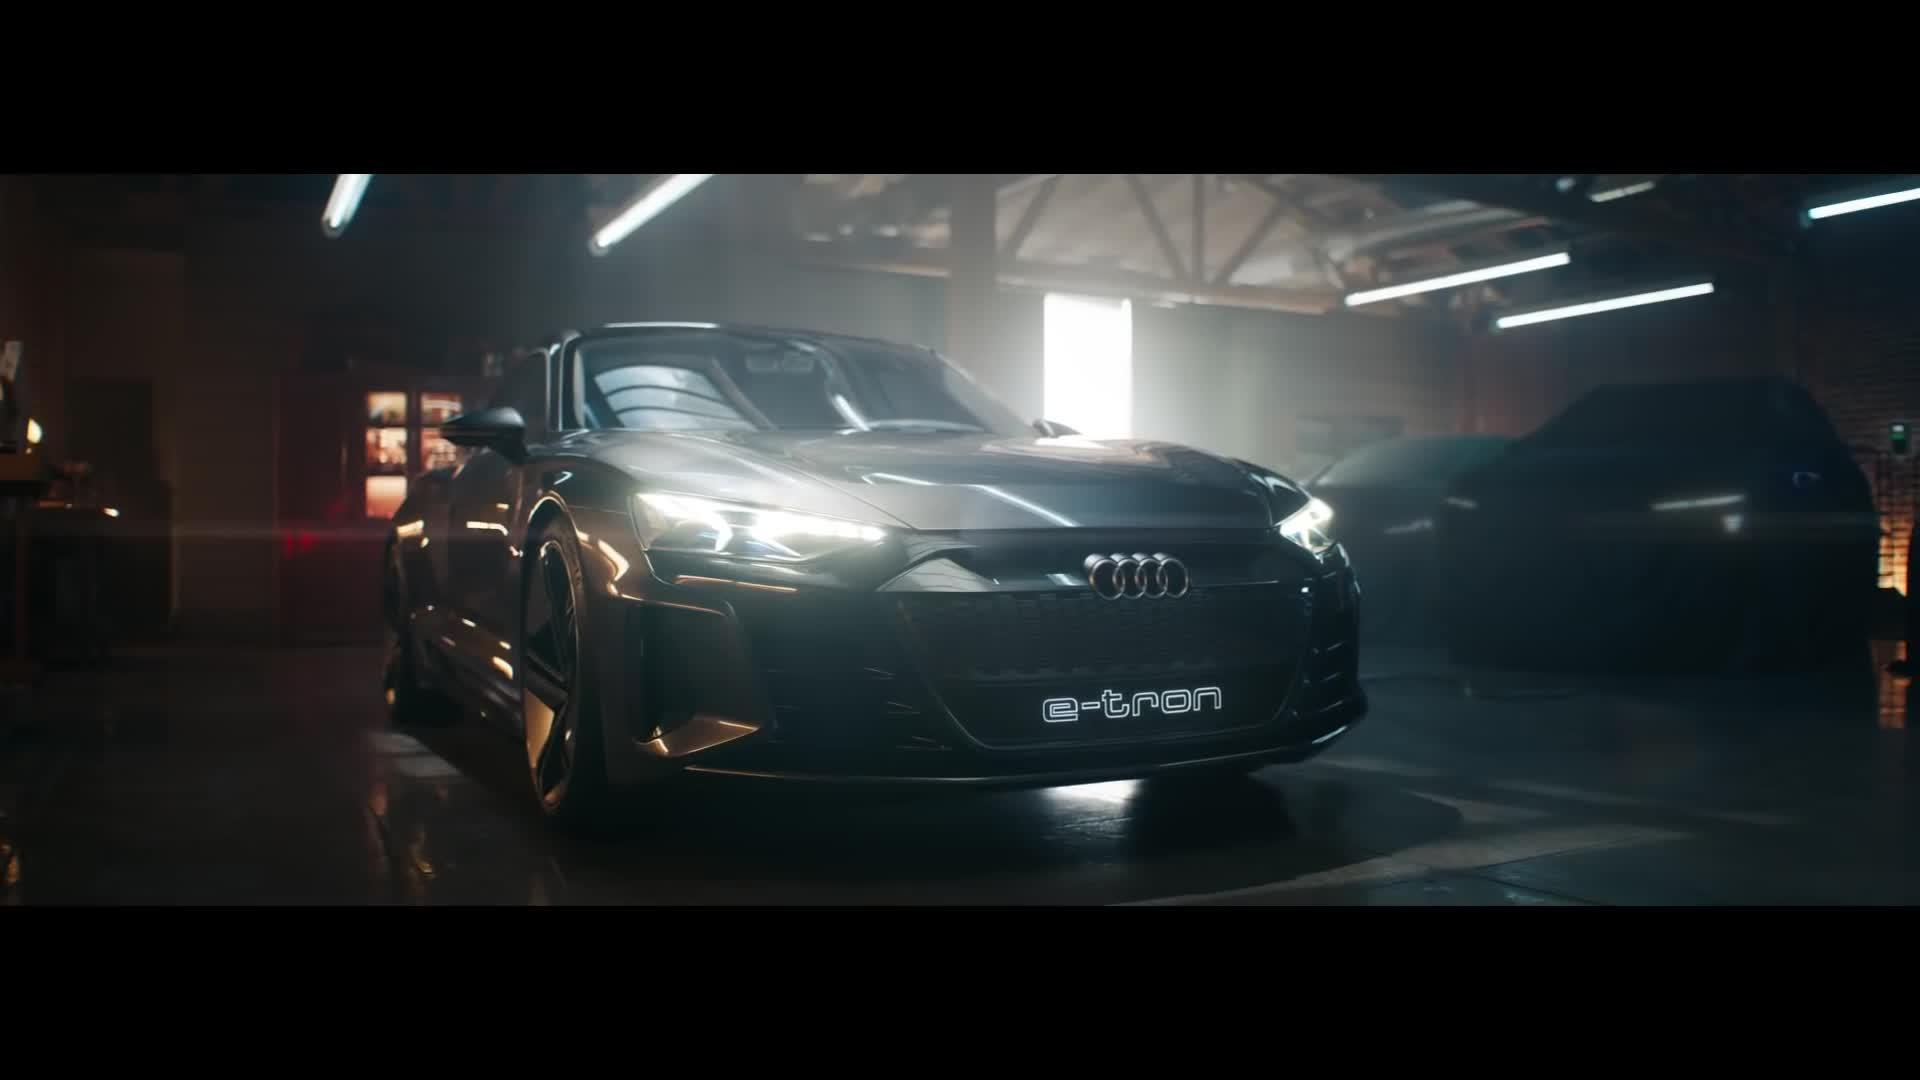 Werbespot, Super Bowl, Super Bowl 2019, Audi, Audi e-tron GT